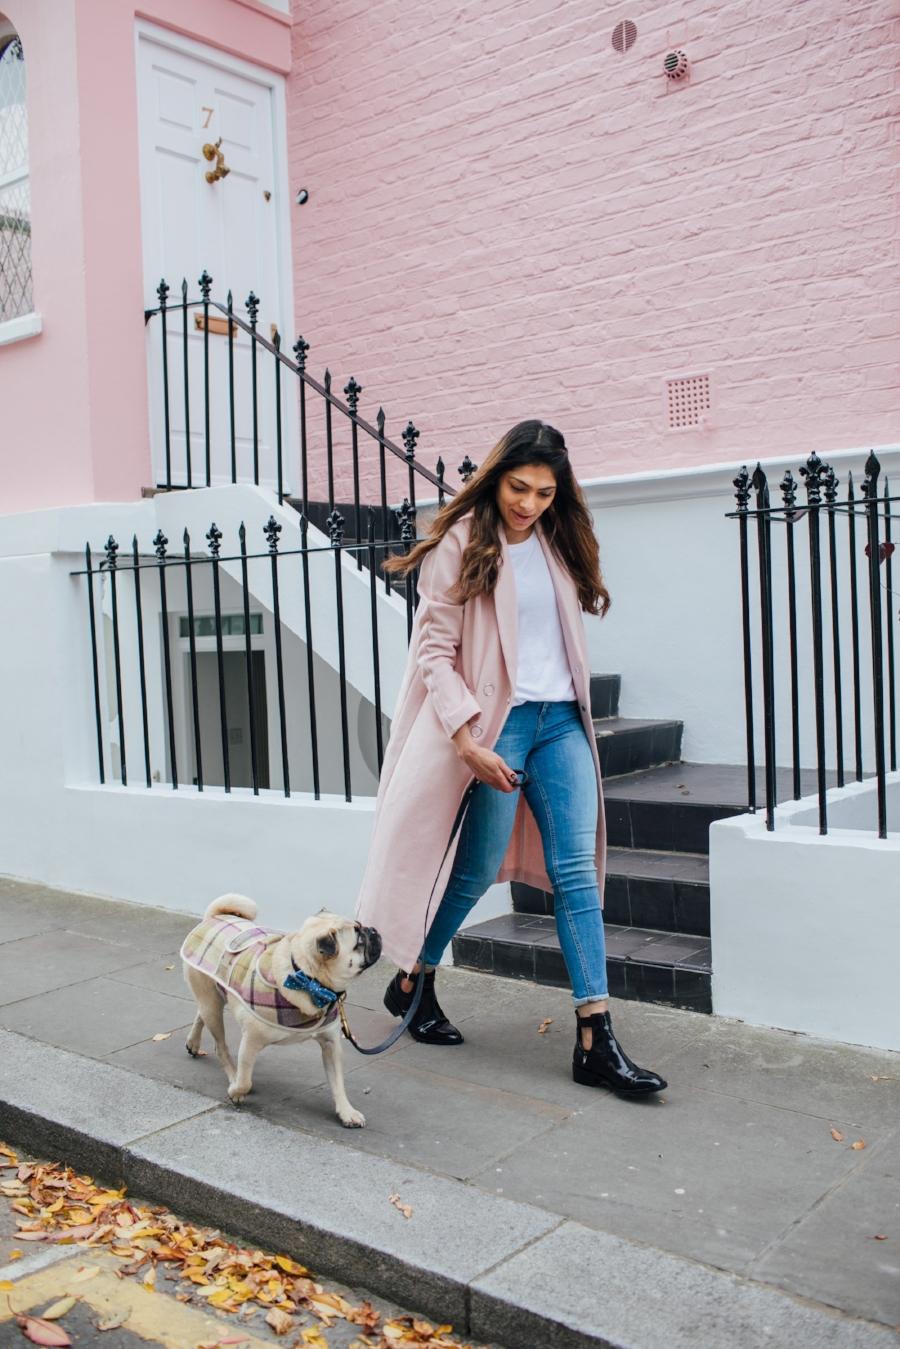 dogblog-london-bestdogbloginlondon-dogfashion-dogfashionblog-fashionandlifestyle-streetstyle-pugswag-humanandhound-pink-fallfashion-falltrends-dogsinclothes-dapperdogs-pug-puglife-bestdressedpug-fashionblogger-newyork-uk-pinkwintercoat-puglife-twinning-bestdressedpug-awesome-best-bestdogbloglondon-dogfashionlondon-coolestdogblog-cooldogs -topdogbloglondon-bestdogblog